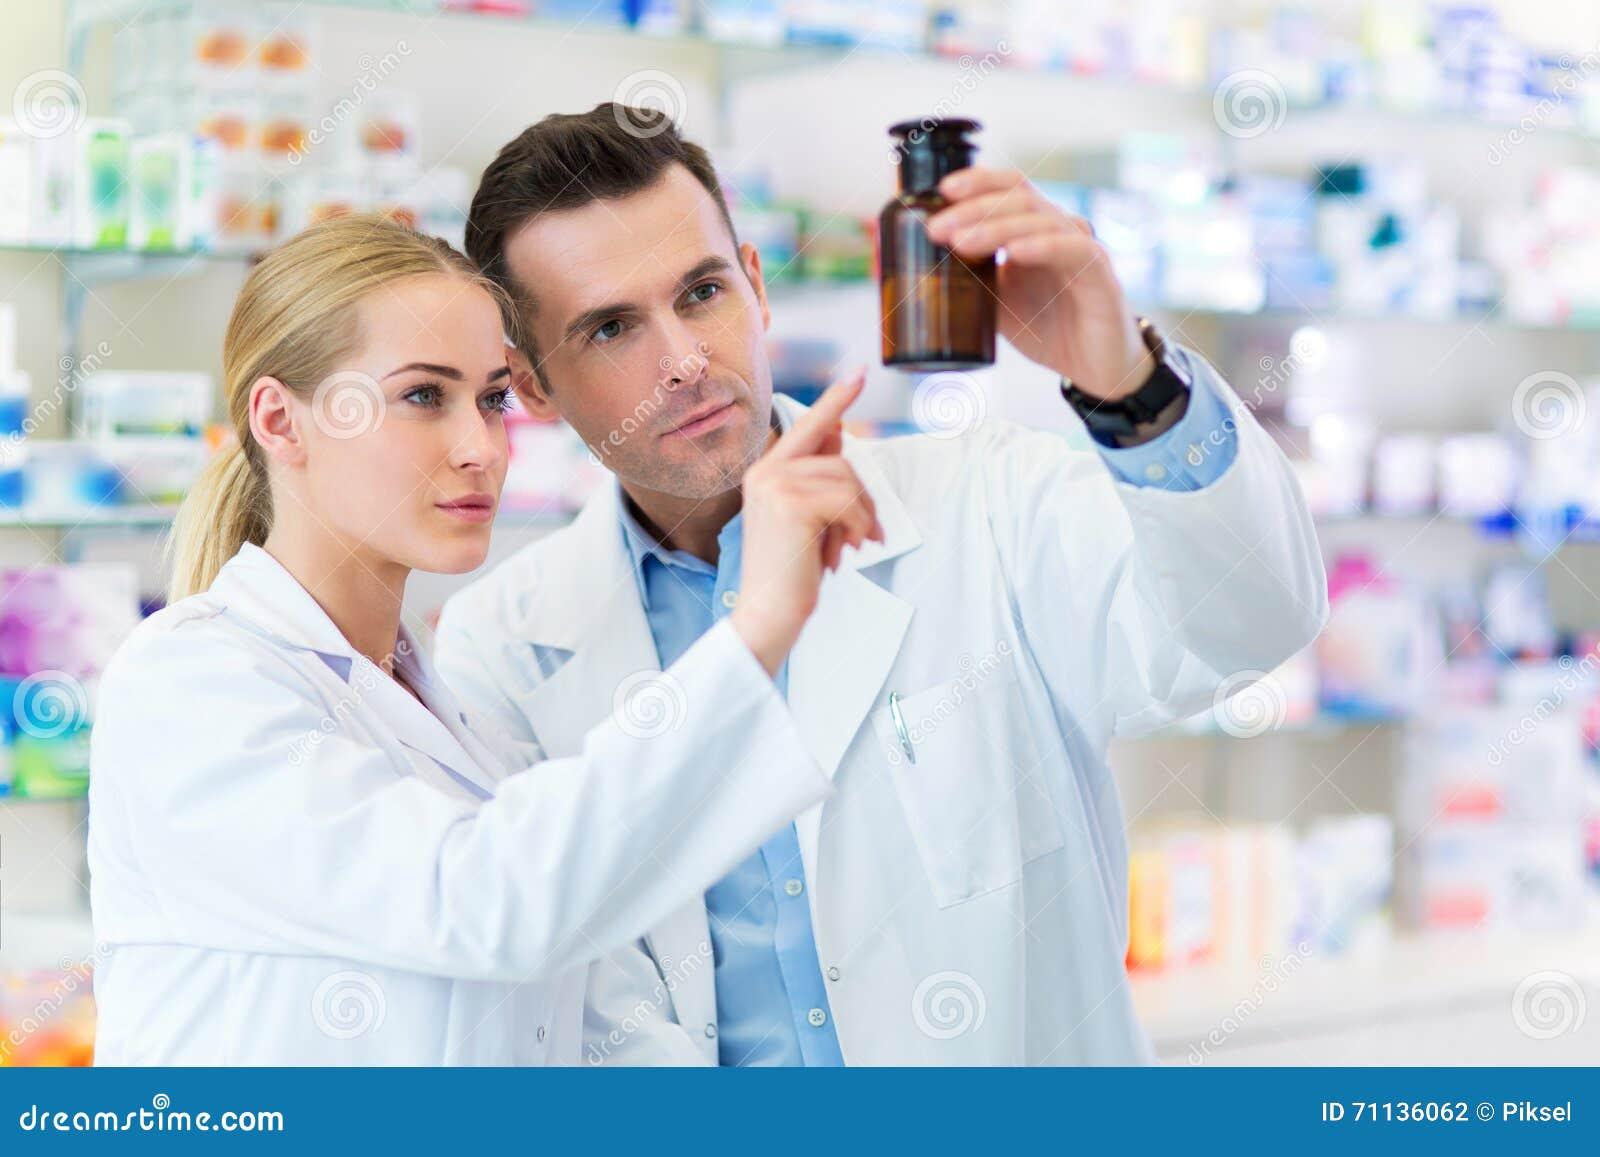 women pharmacists An arizona woman said a pharmacist denied the prescription in april the pharmacist is no longer employed by the company, a cvs spokesman said.